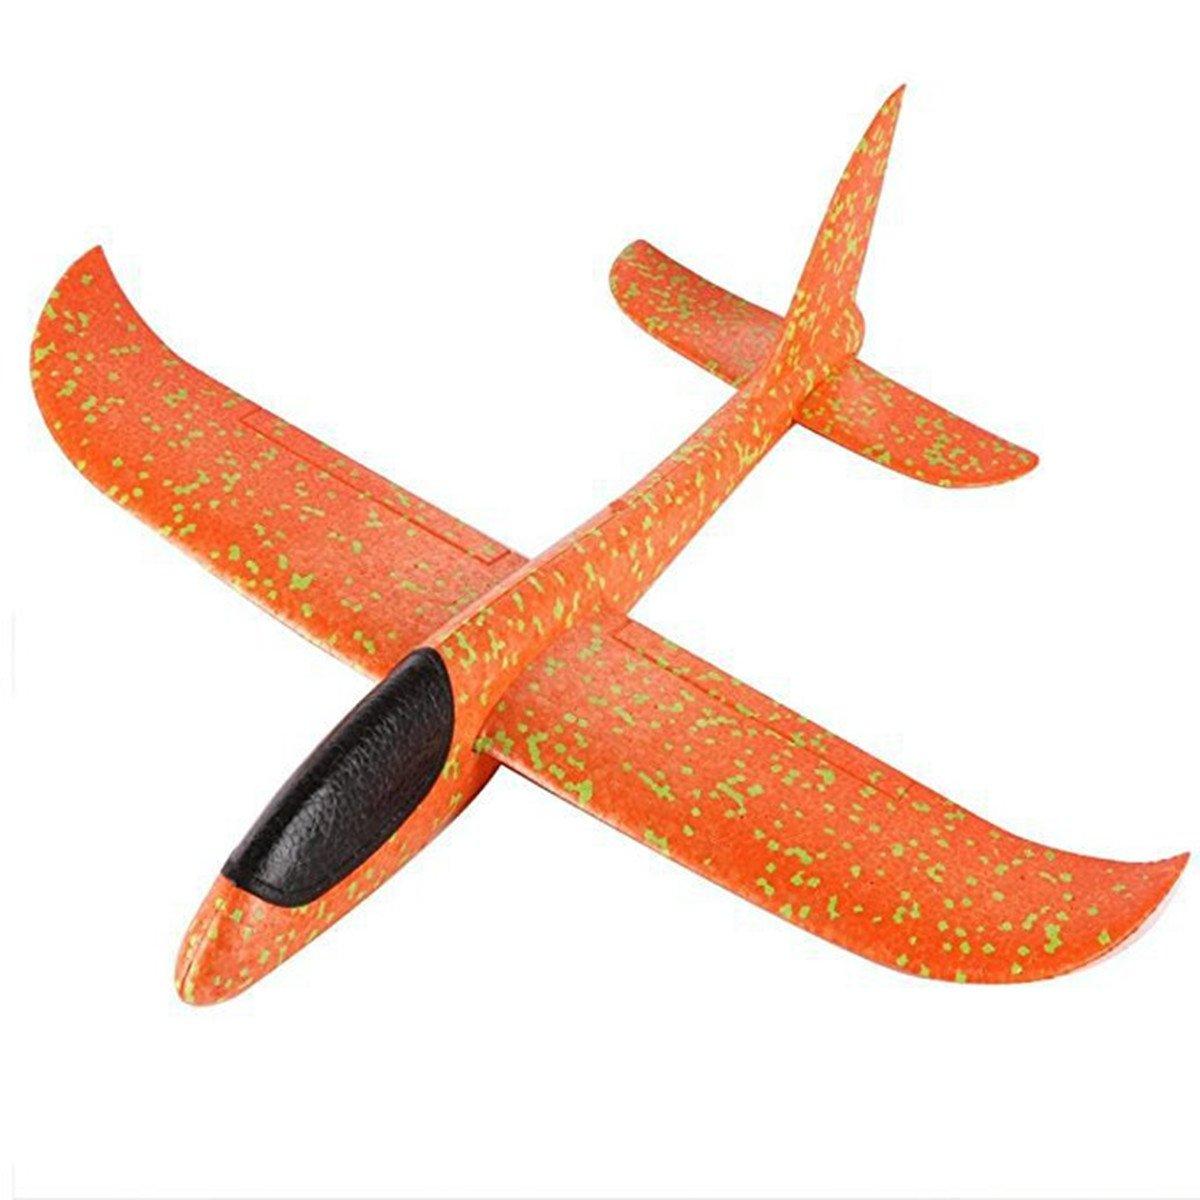 Genossen - Avión planeador, juguete infantil, 35 cm